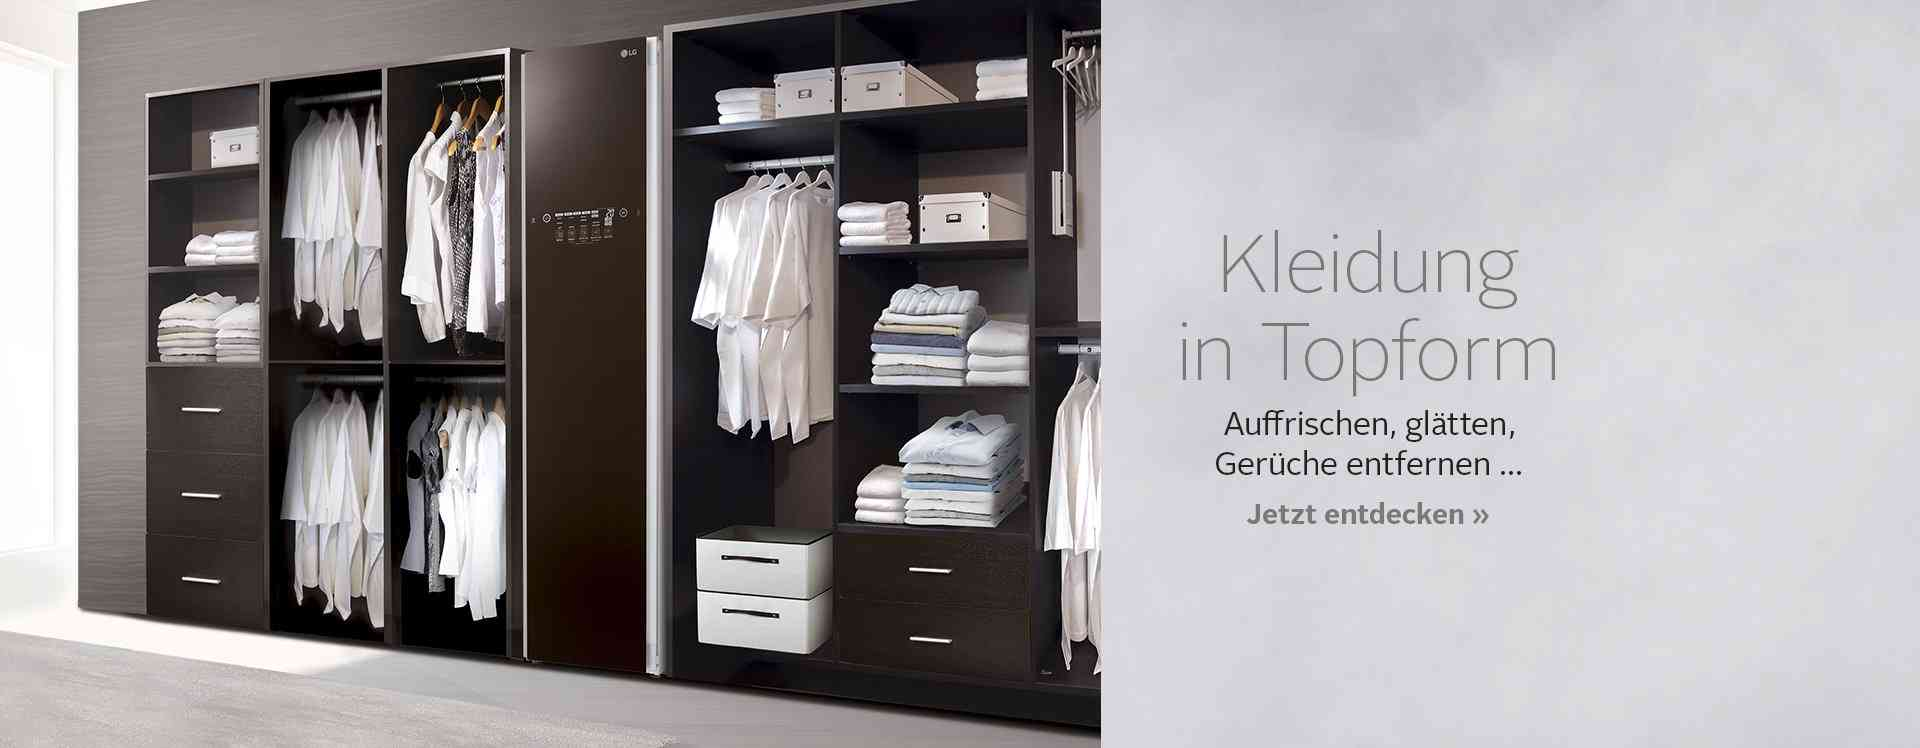 lg haushaltsger te online shop otto. Black Bedroom Furniture Sets. Home Design Ideas